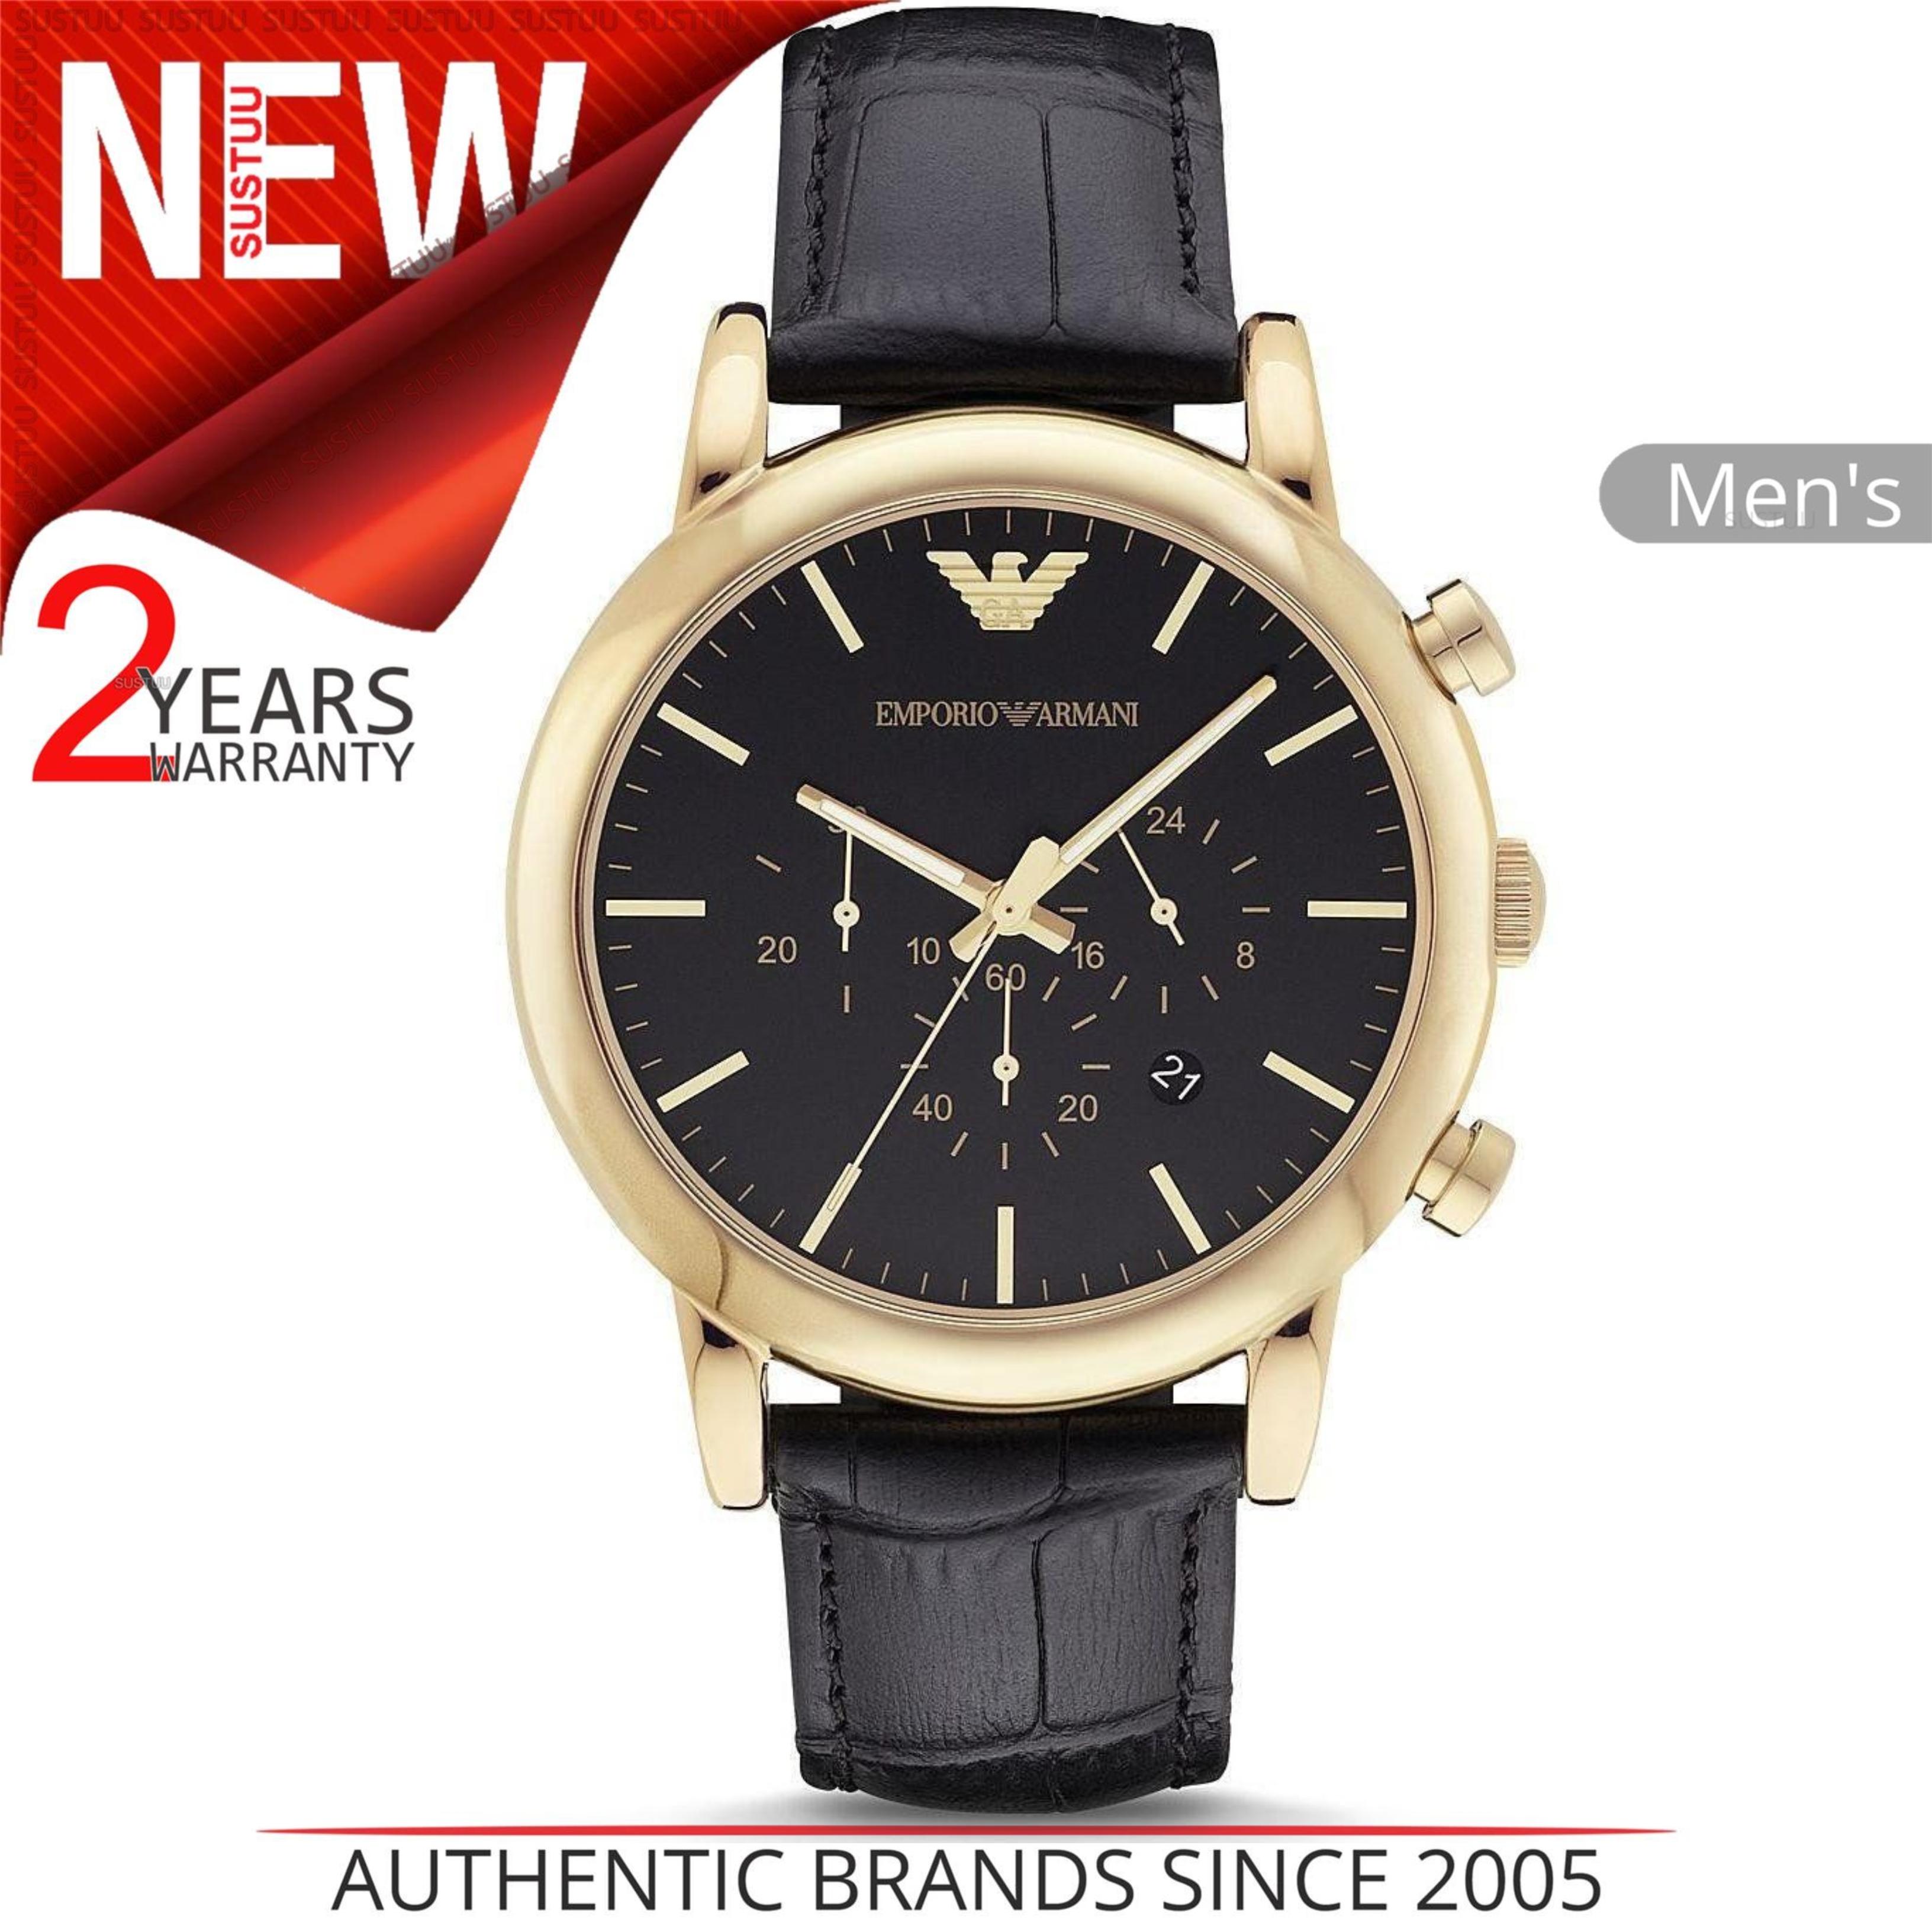 3642c9bde614 CENTINELA Reloj Emporio Armani Luigi para hombre AR1917│ Cronógrafo con  esfera negra St Correa de cuero